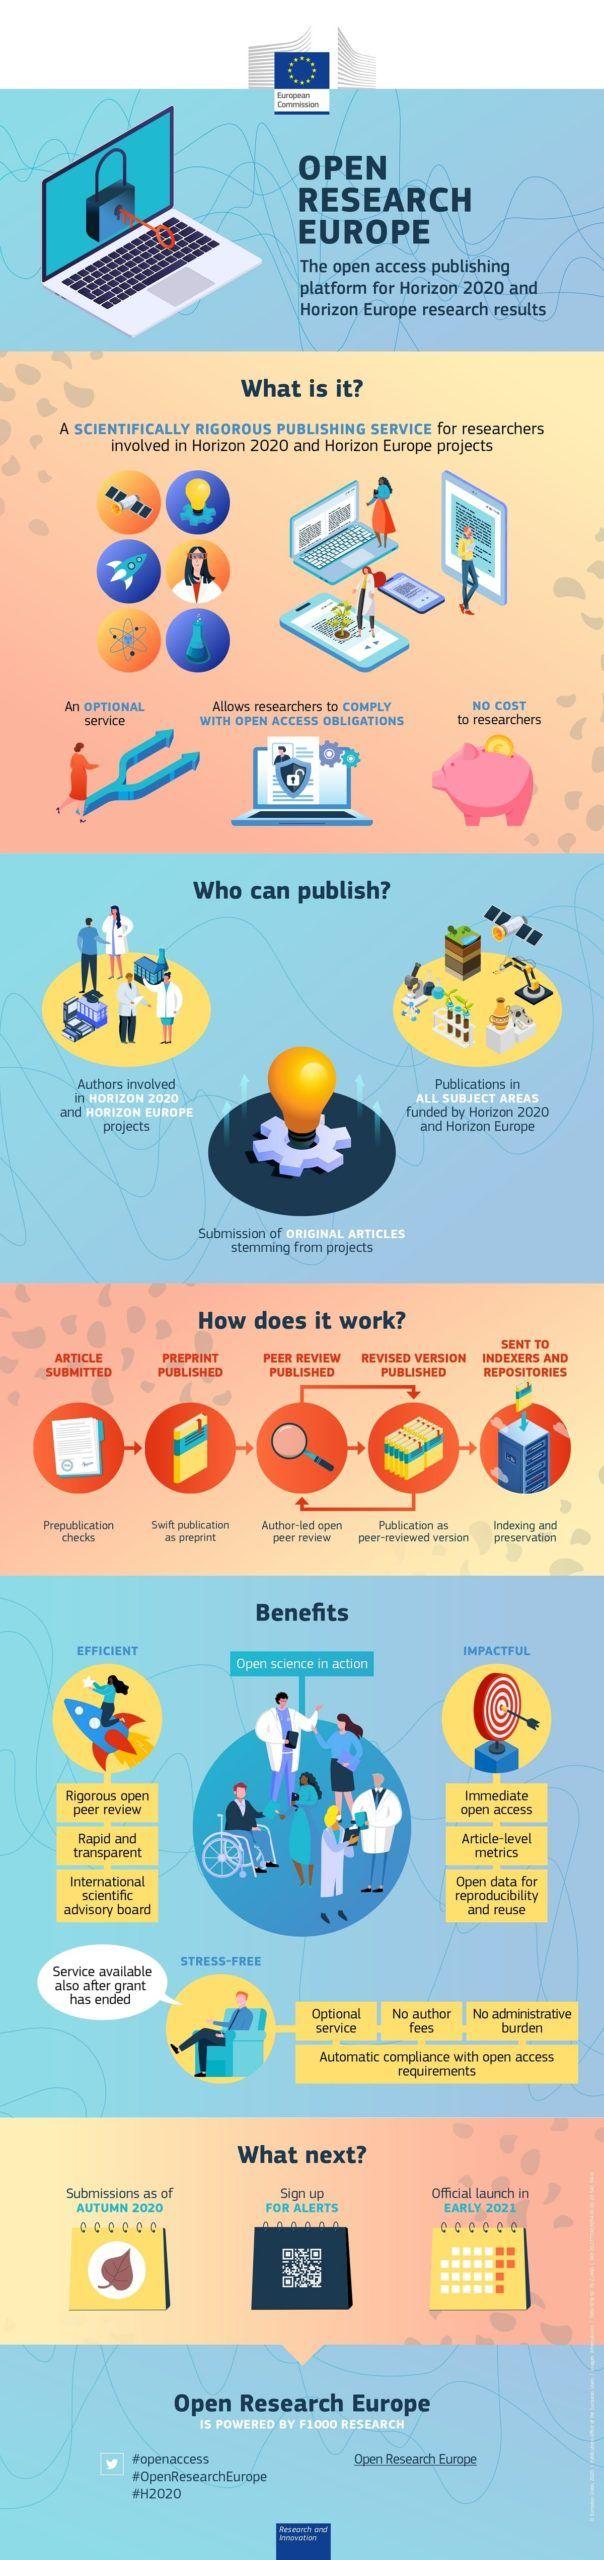 Open Research Europe plataforma de publicación de acceso abierto